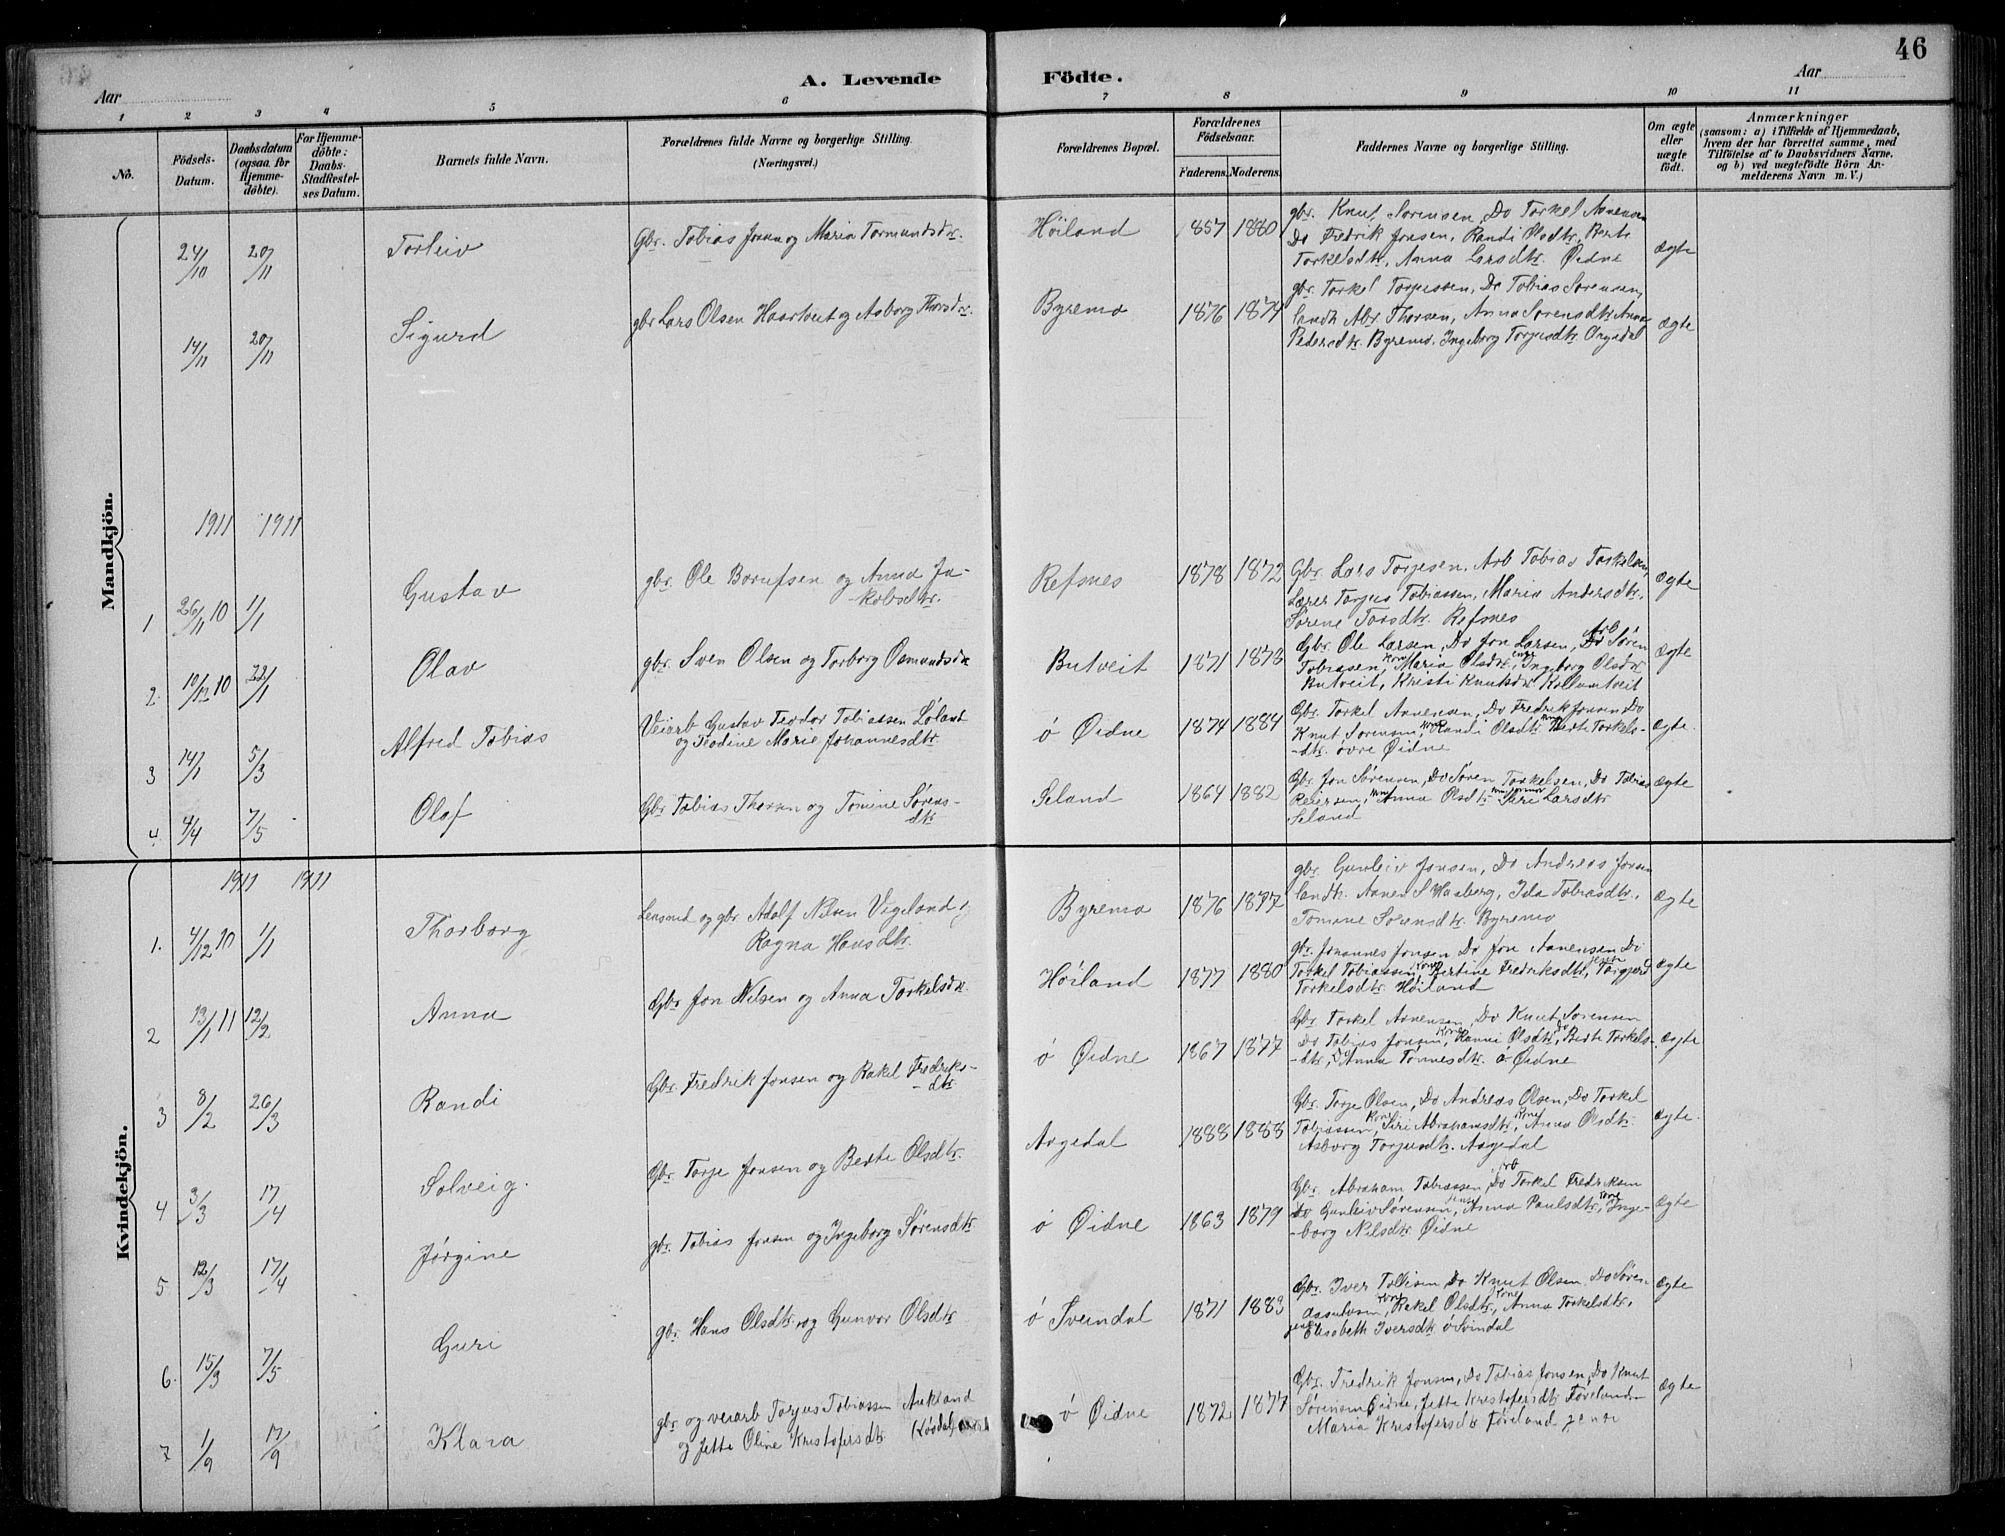 SAK, Bjelland sokneprestkontor, F/Fb/Fbc/L0003: Klokkerbok nr. B 3, 1887-1924, s. 46